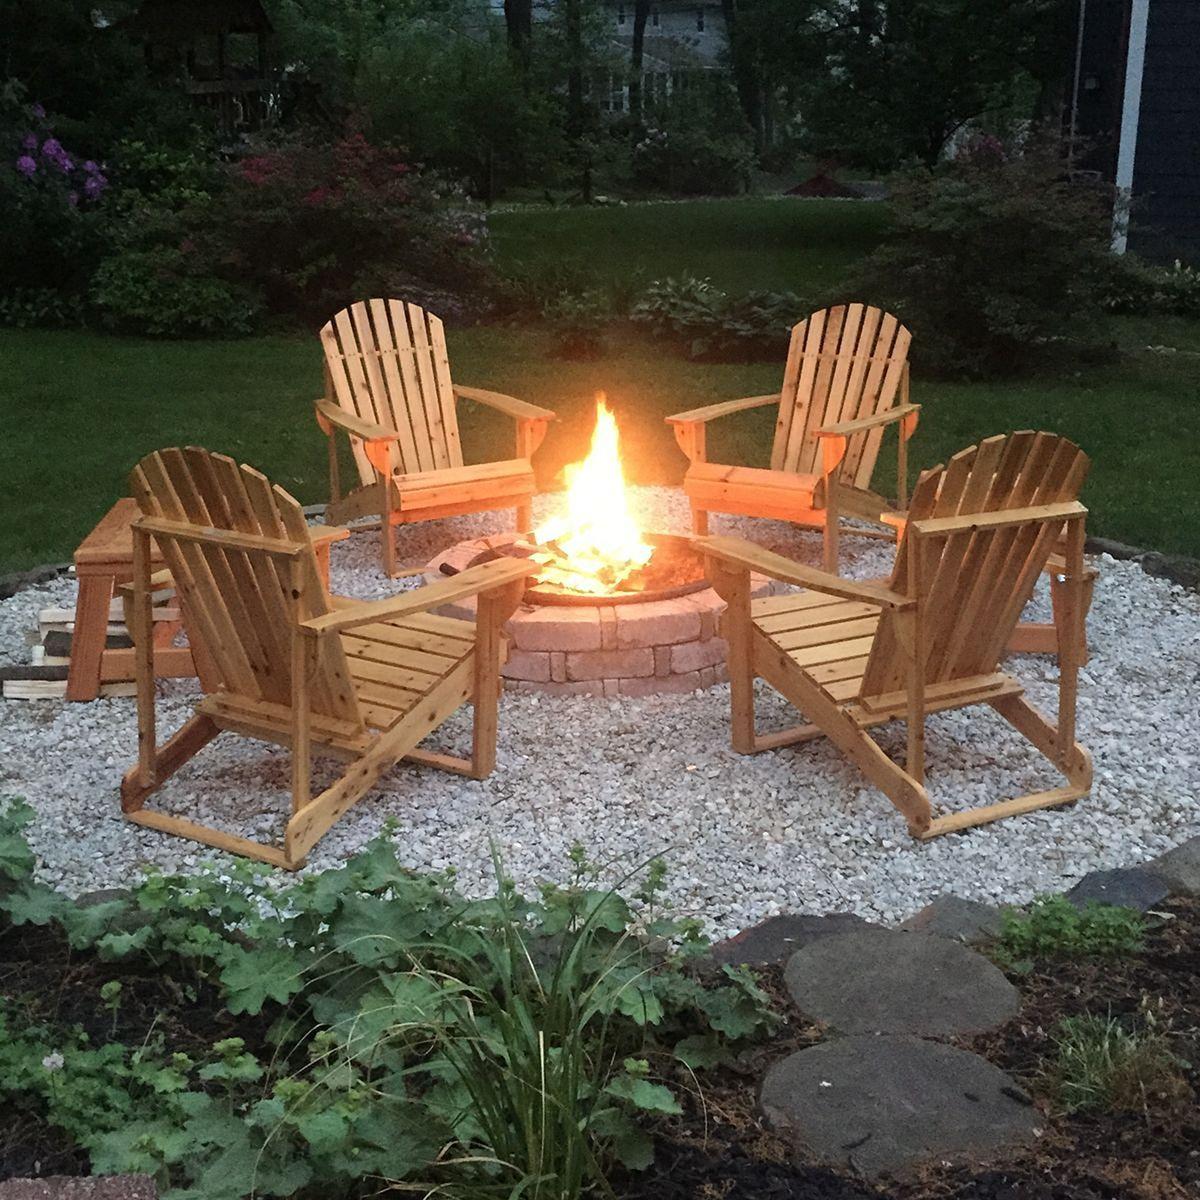 Home garden furniture   Super Cool Backyards Design For Your Perfect Home Garden